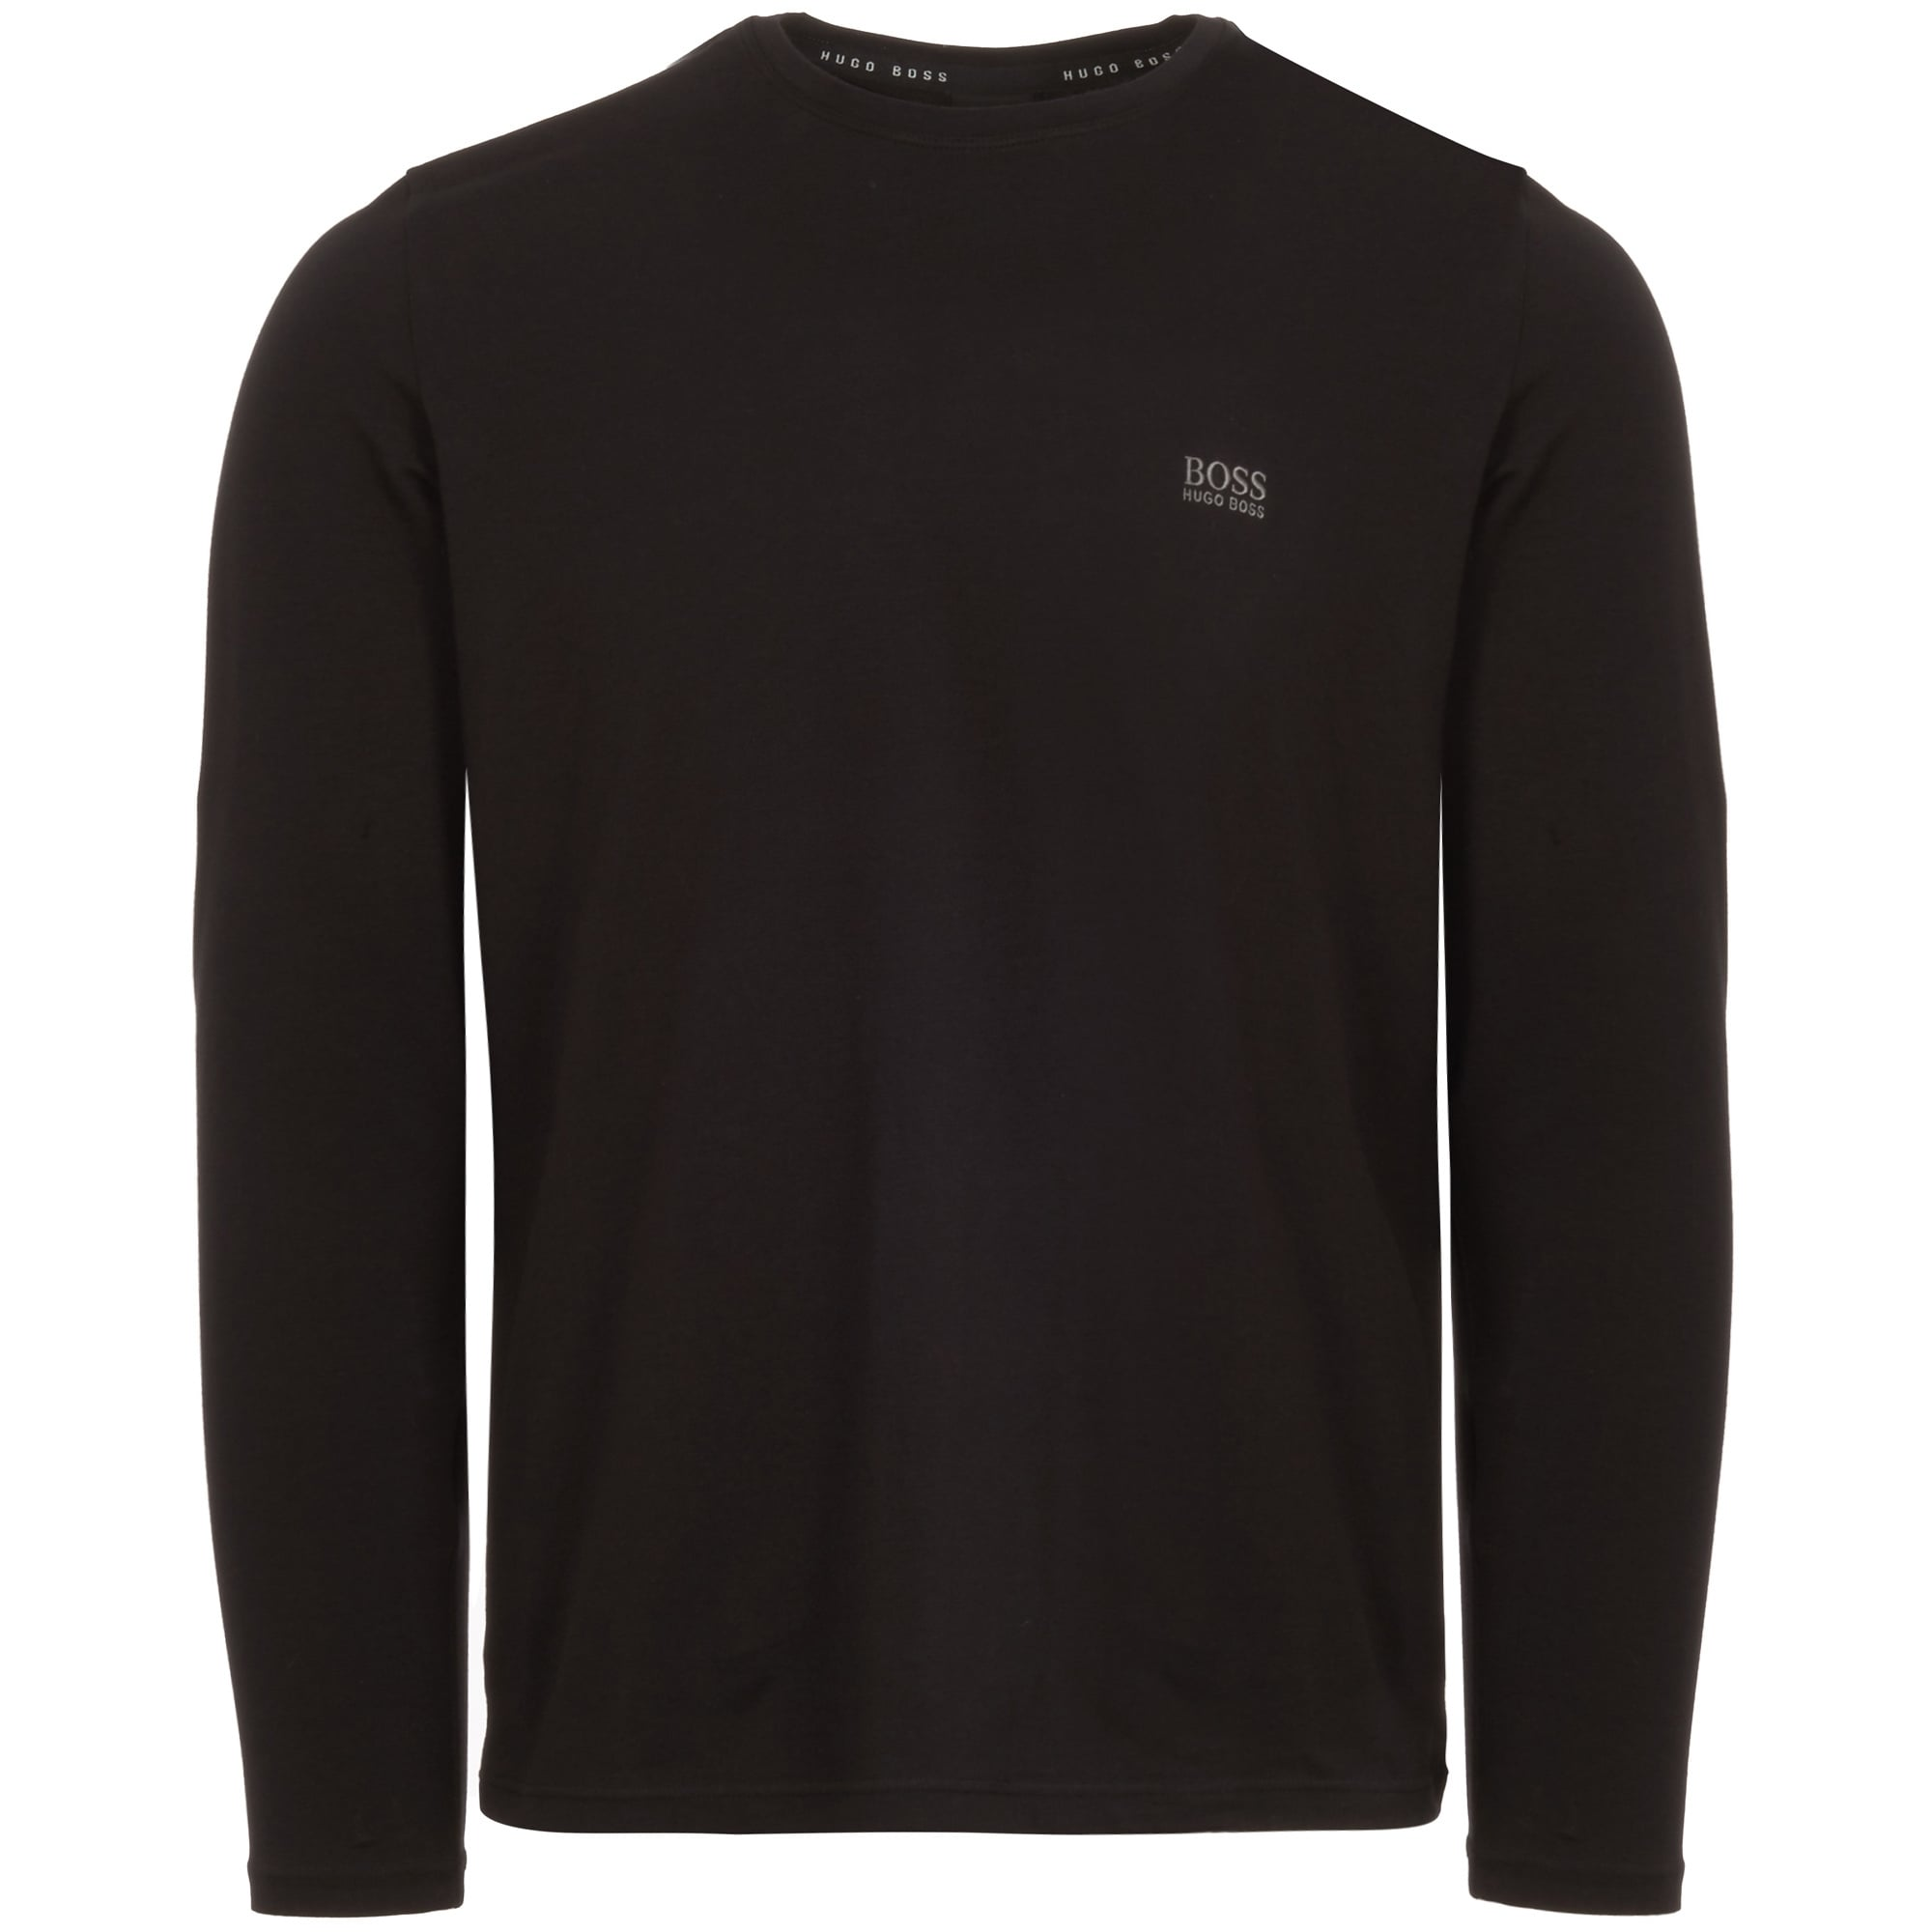 da0d4f1d Hugo Boss Black Long Sleeve T-Shirt | Stuarts London